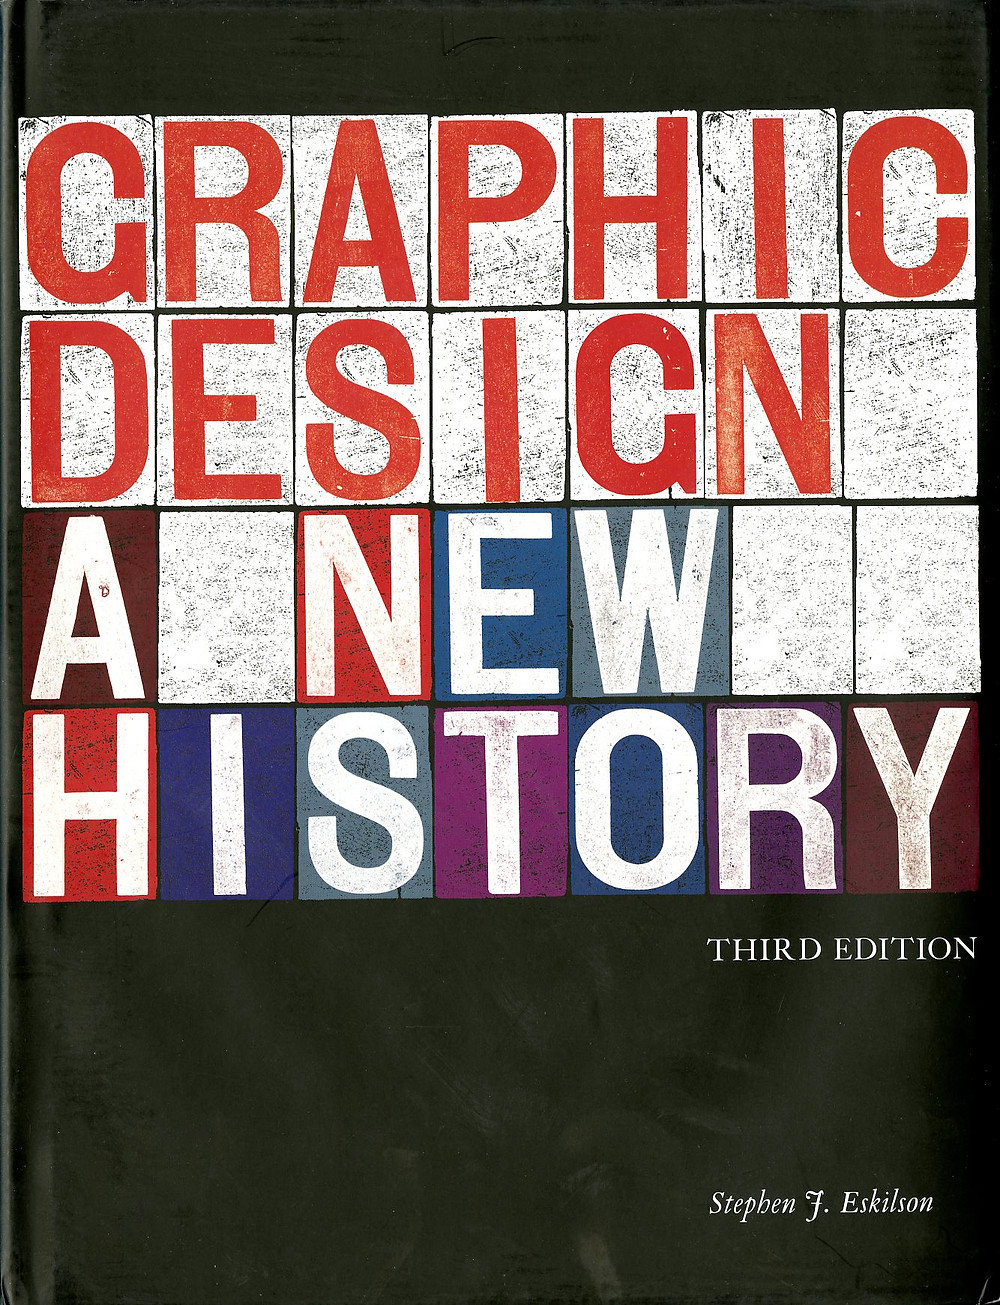 Steven Heller looks at books of graphic design history.